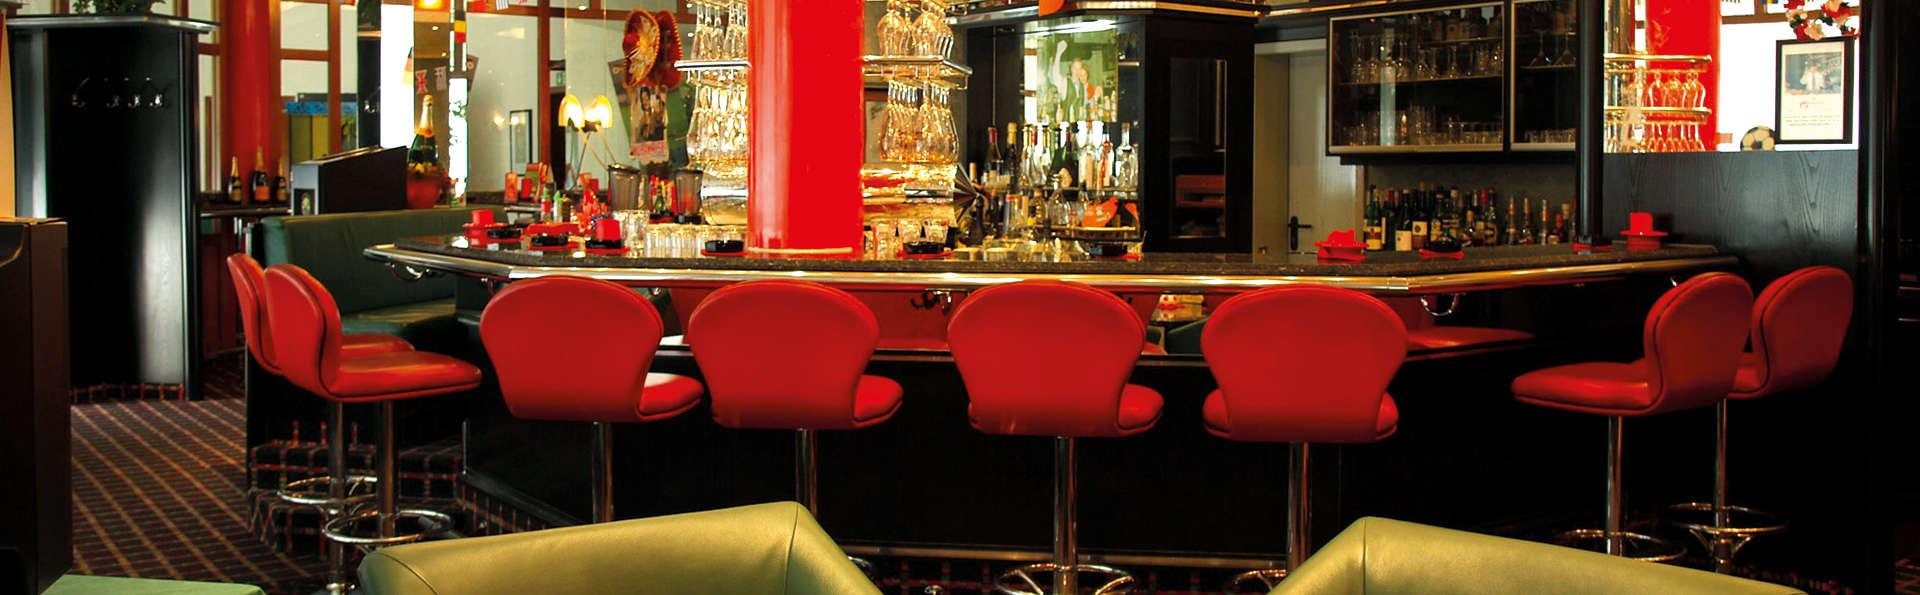 h hotel stuttgart herrenberg h tel de charme herrenberg. Black Bedroom Furniture Sets. Home Design Ideas